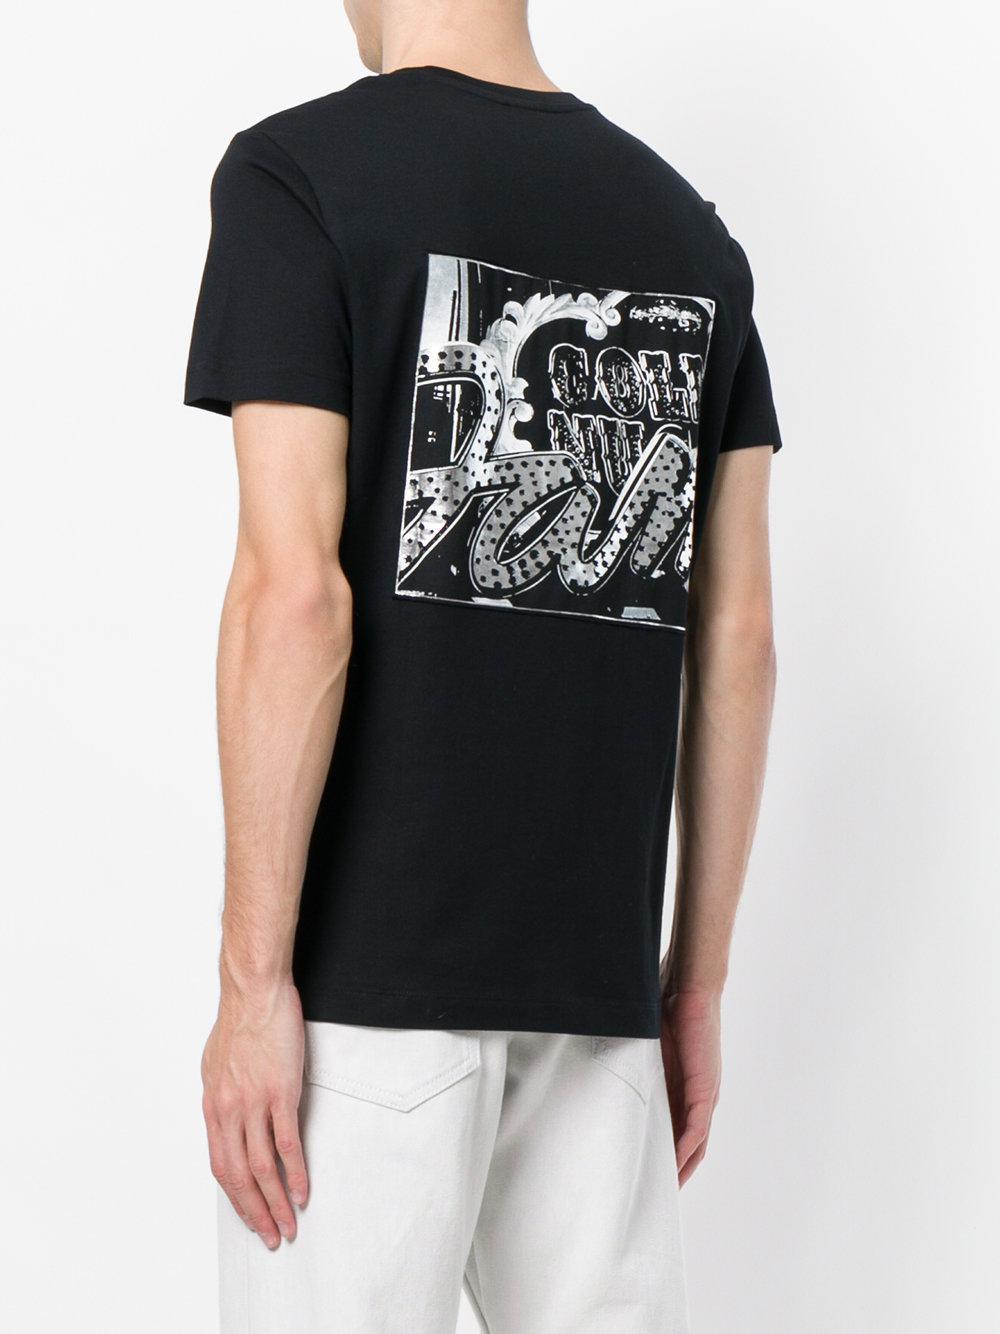 Outlet Store Cheap Online T-Diego-WF t-shirt - Black Diesel Geniue Stockist Choice Cheap Price Fashionable Factory Outlet Sale Online AZSYt